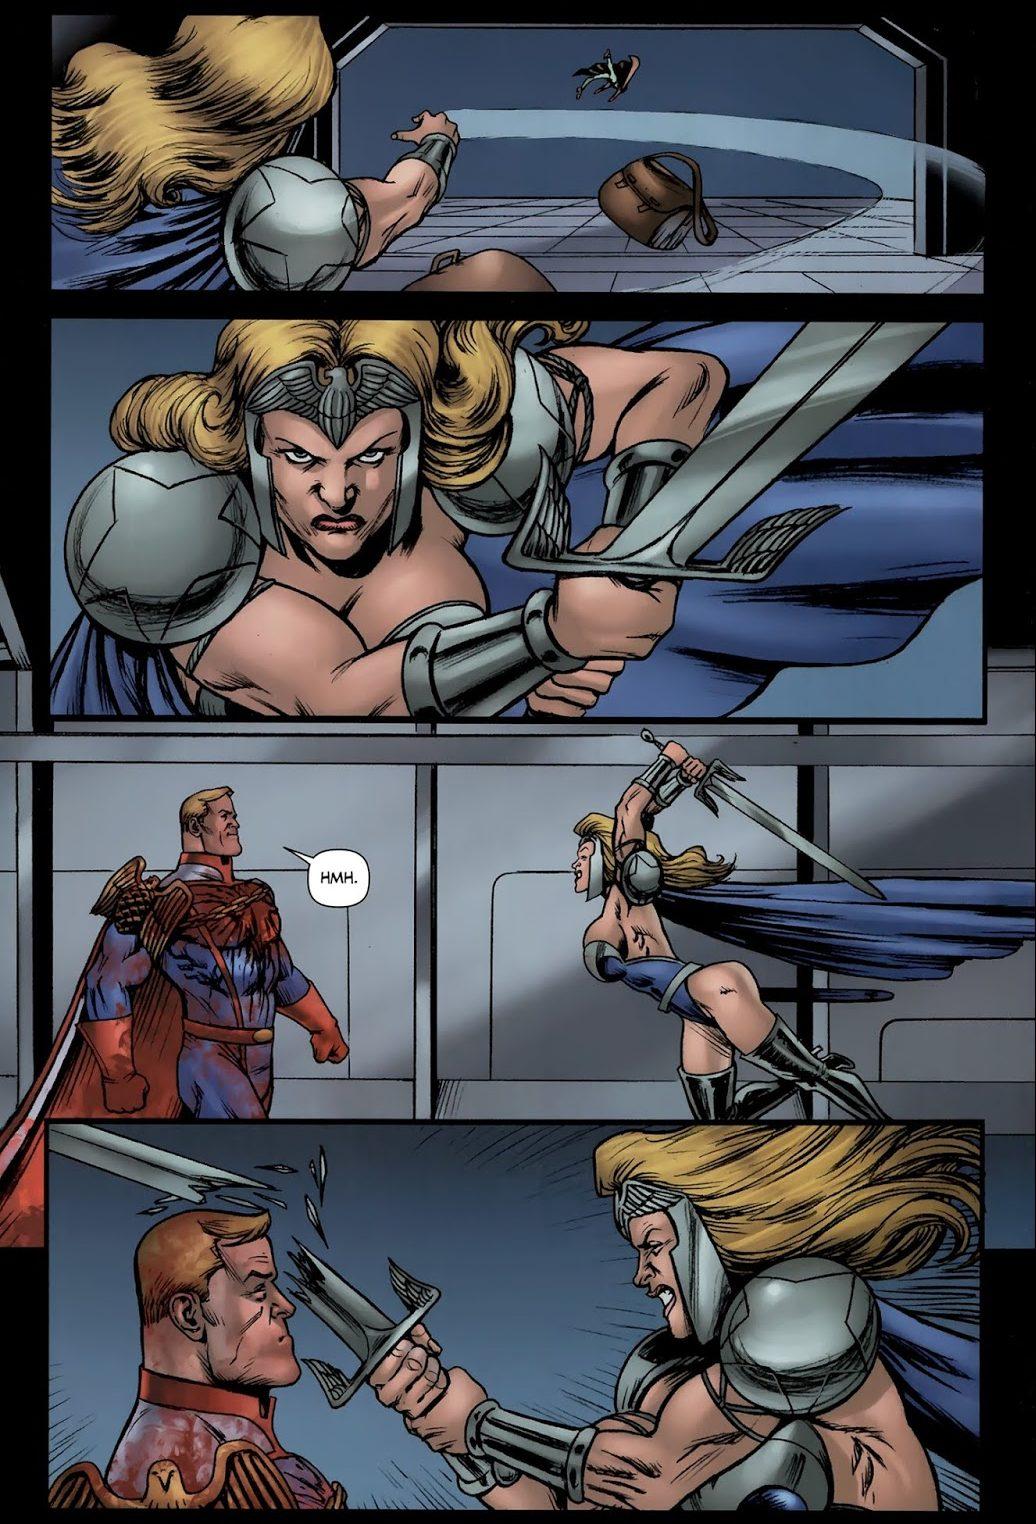 Homelander Kills Queen Maeve